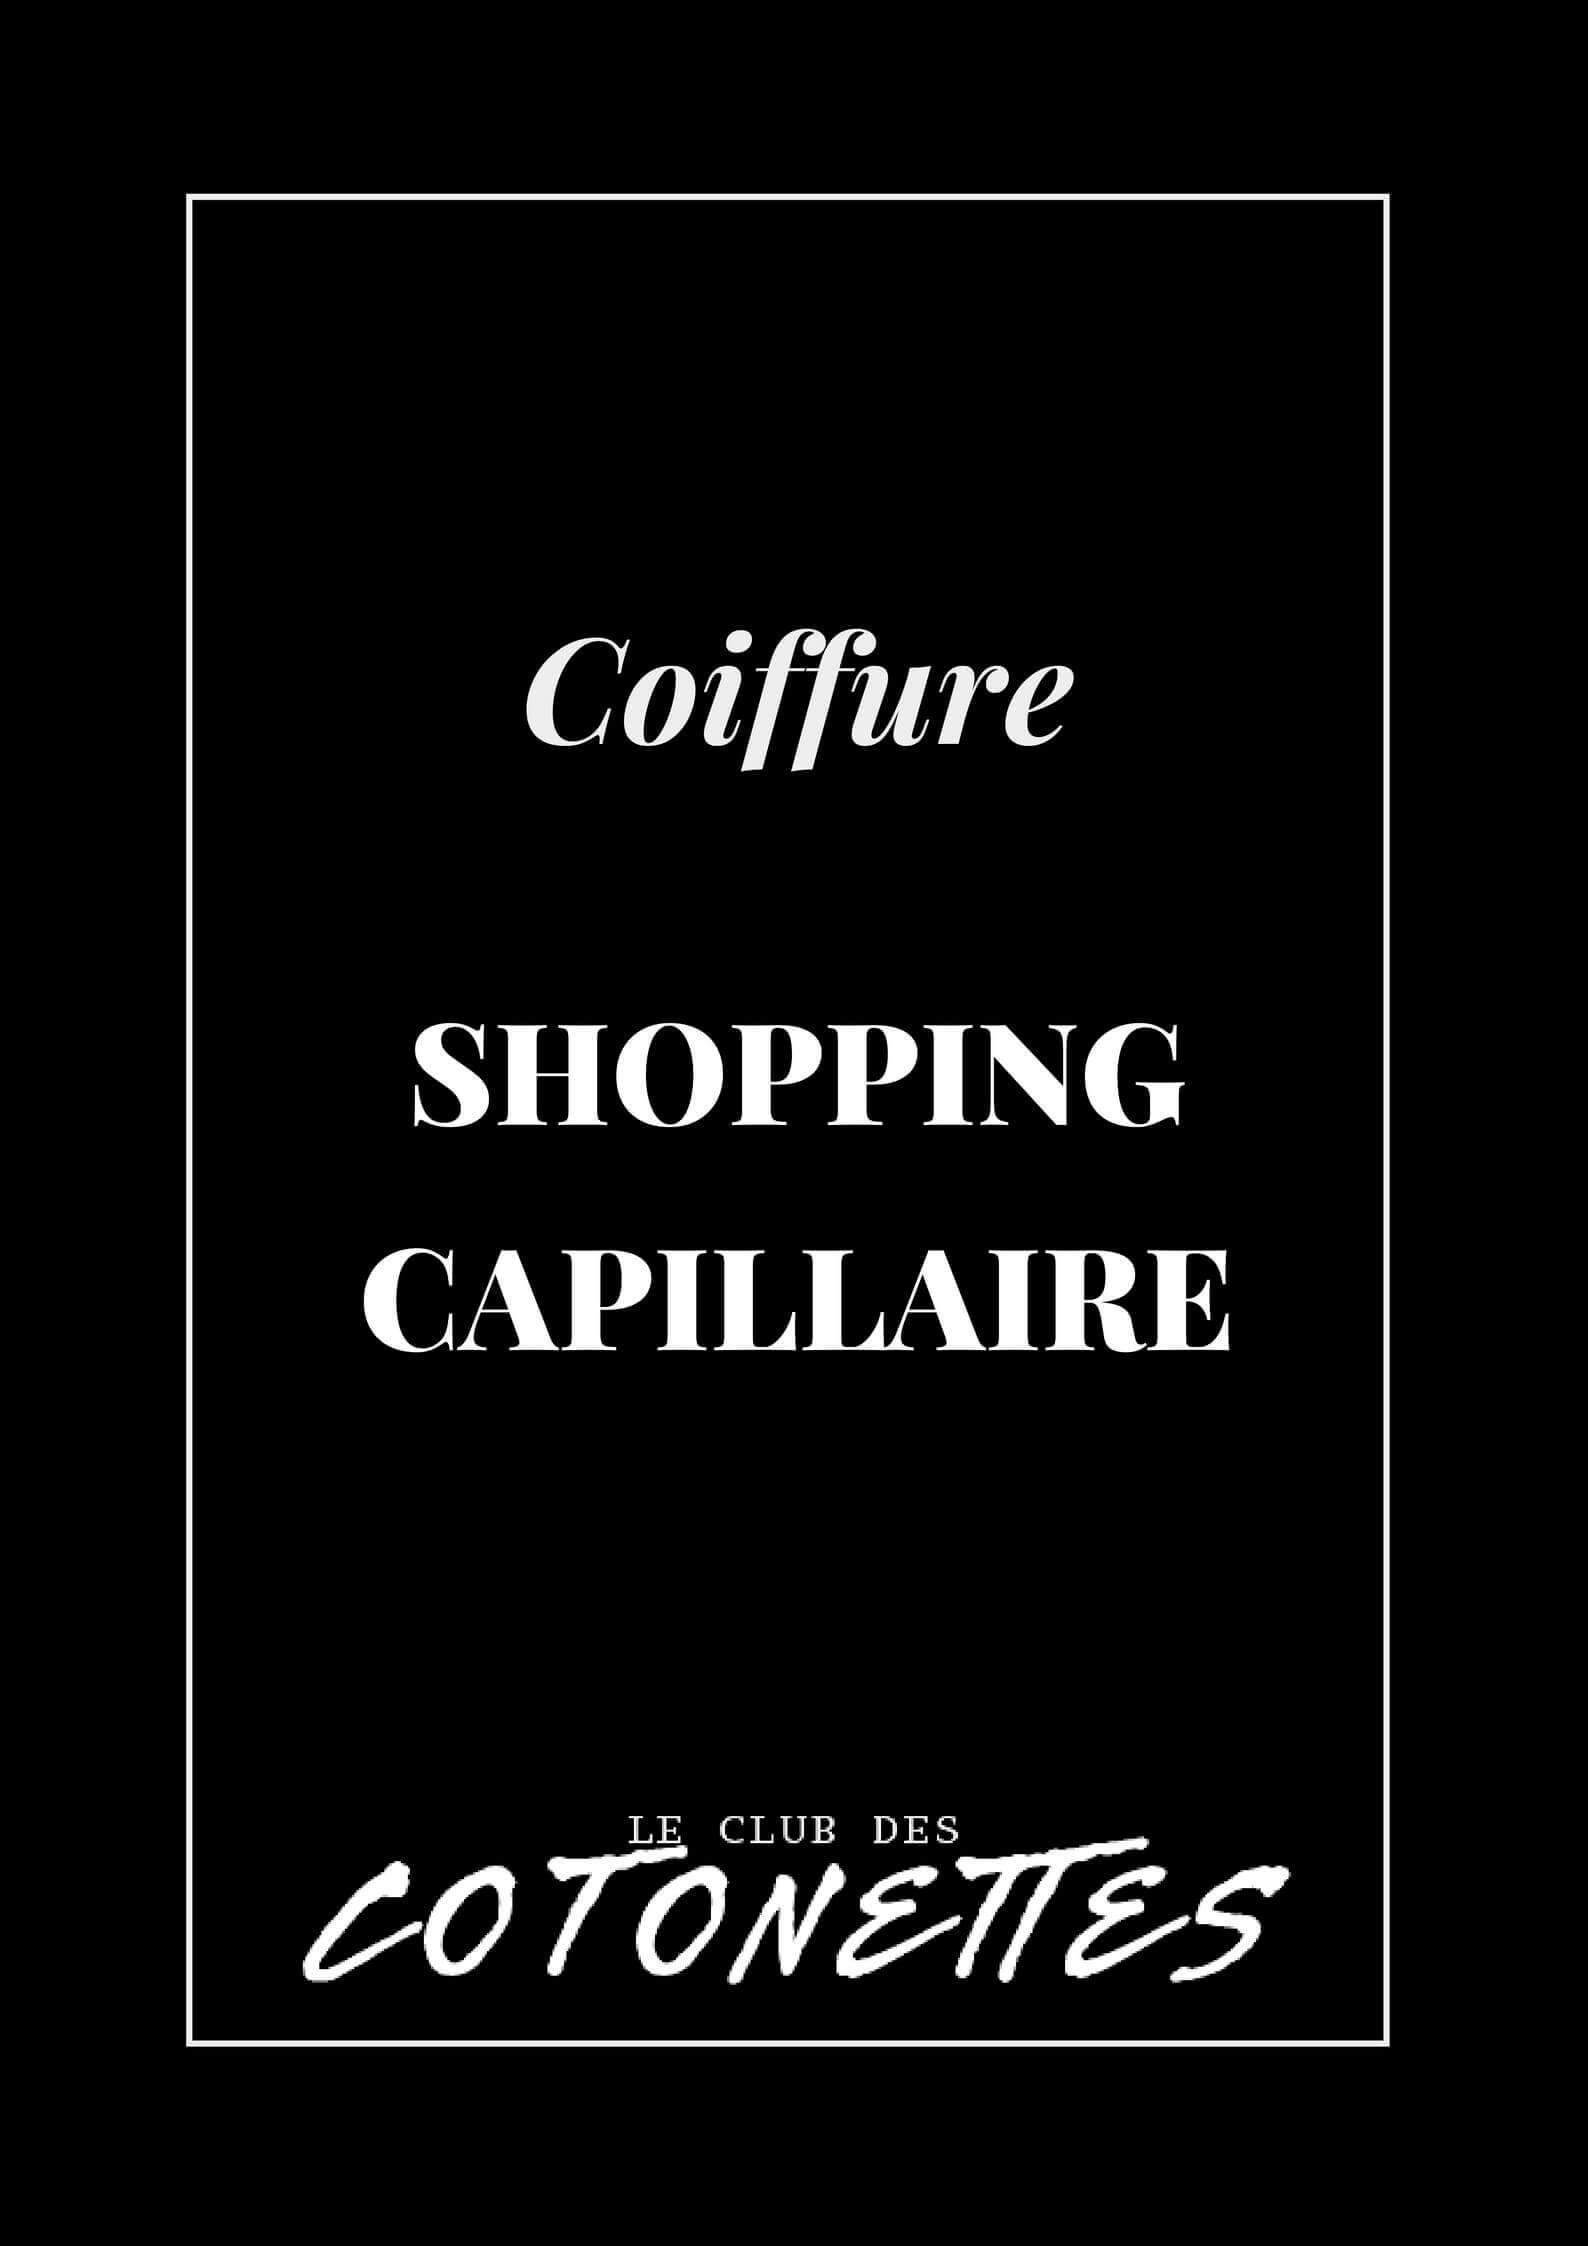 Shopping Produits Capillaires